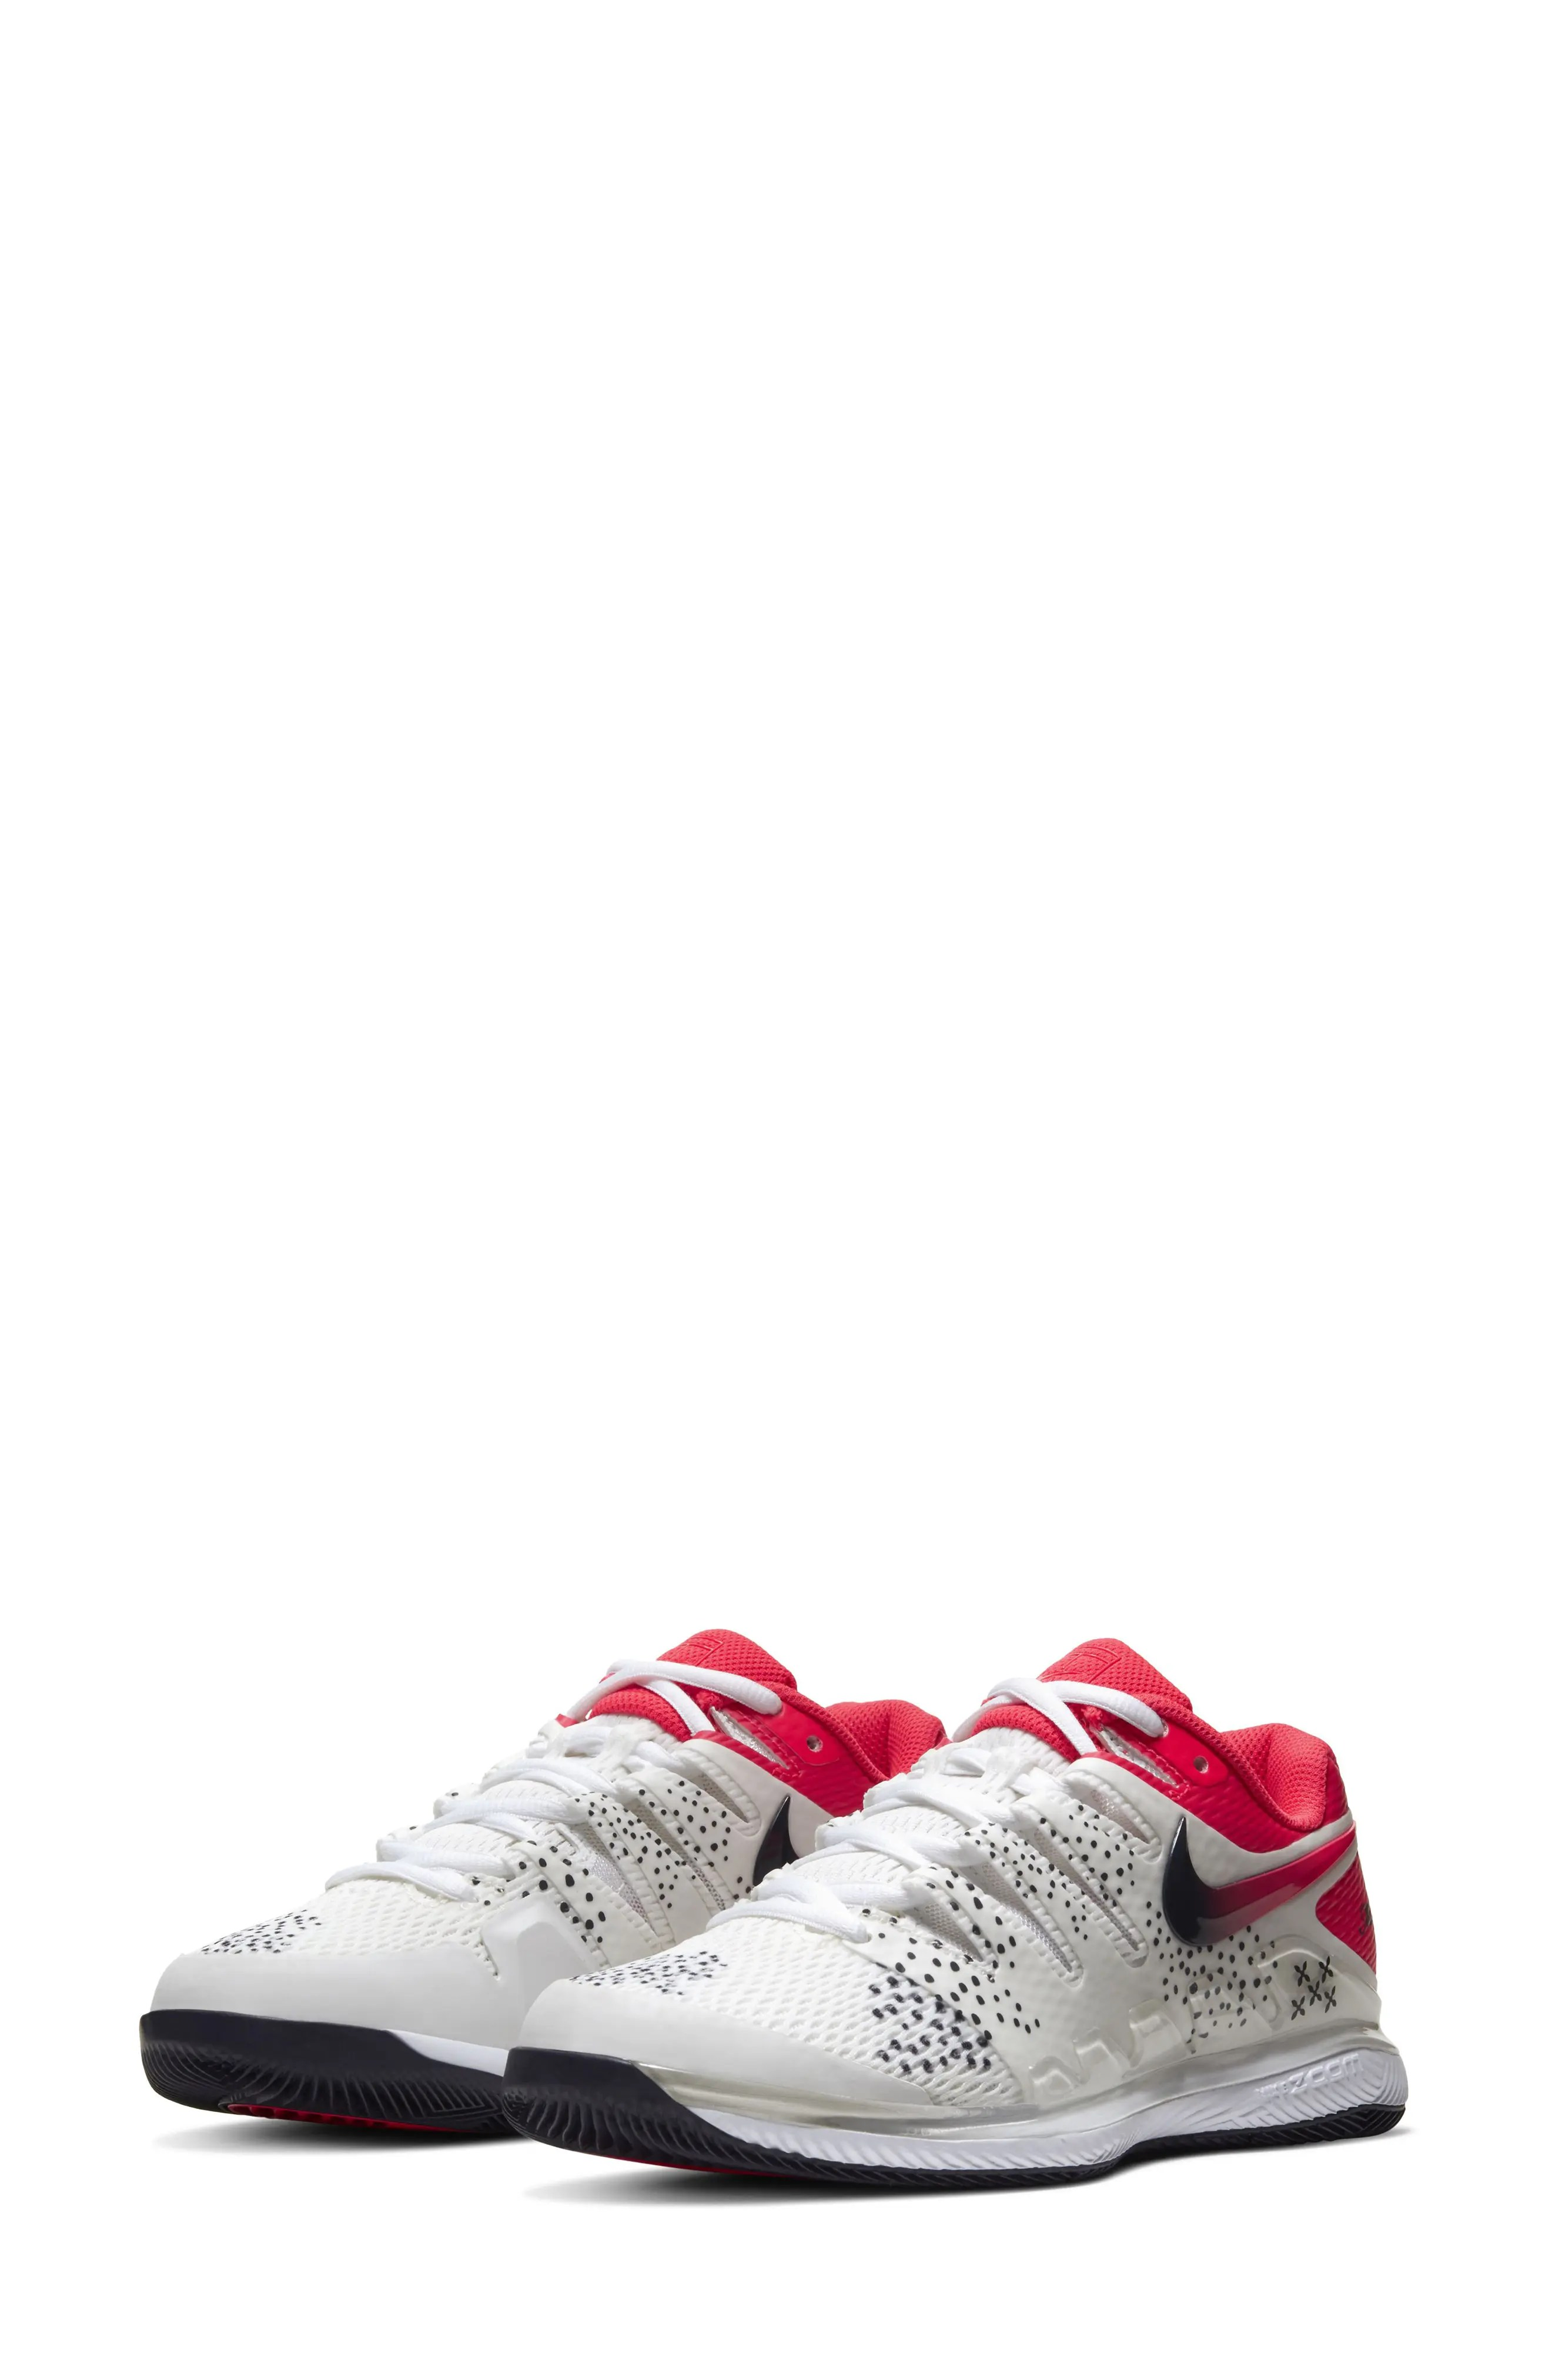 nike air zoom vapor x tennis shoe